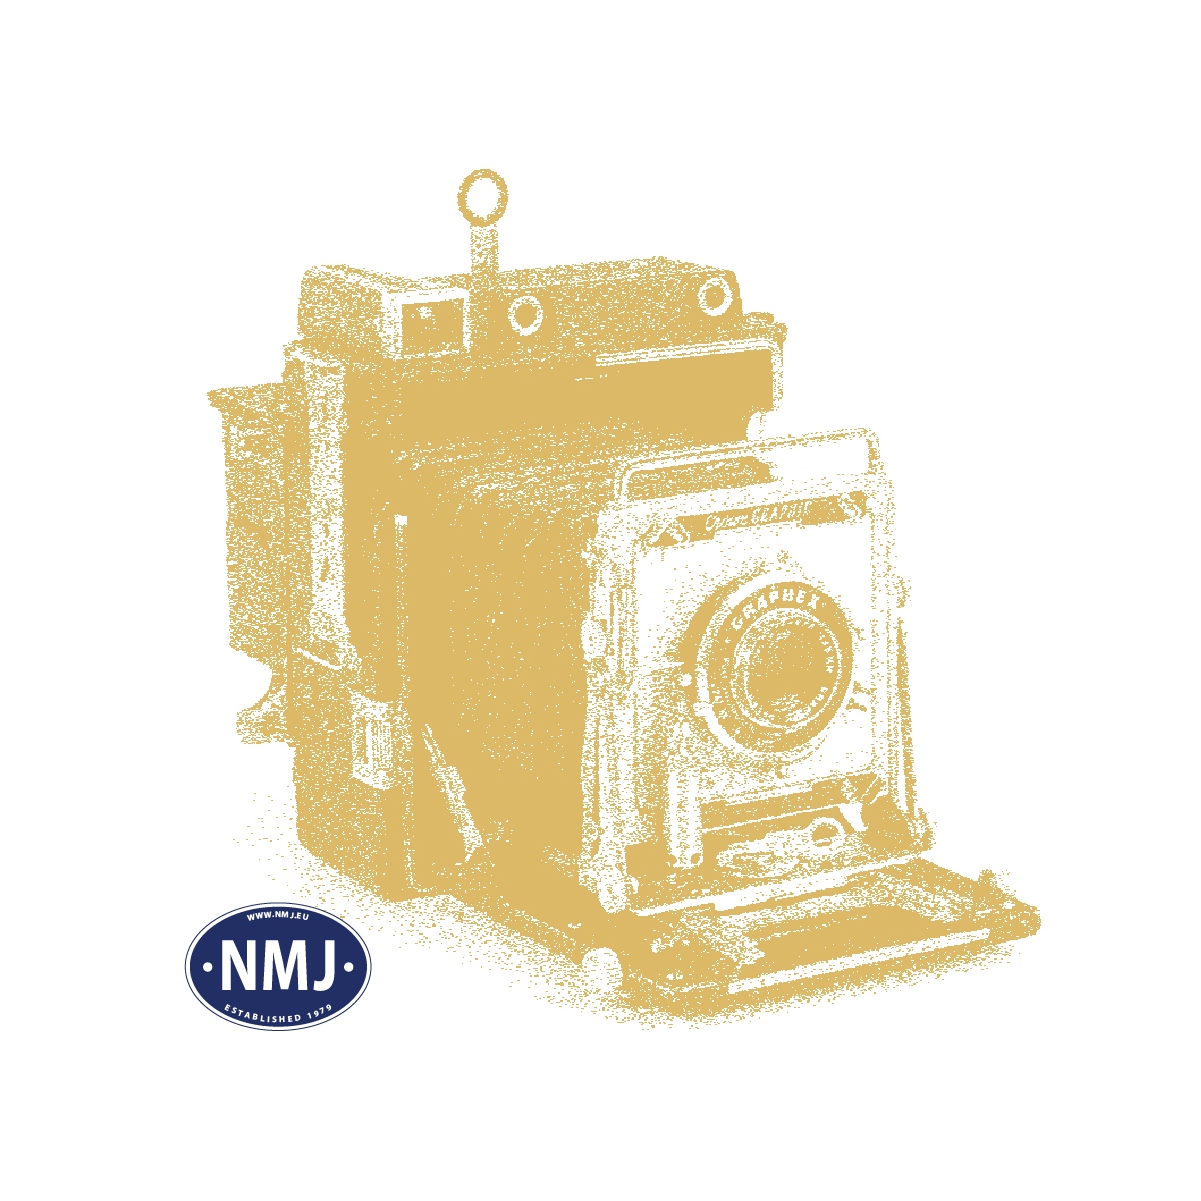 NMJT107.101 - NMJ Topline Personenwagen B3-2 25572 der NSB, rotbraun